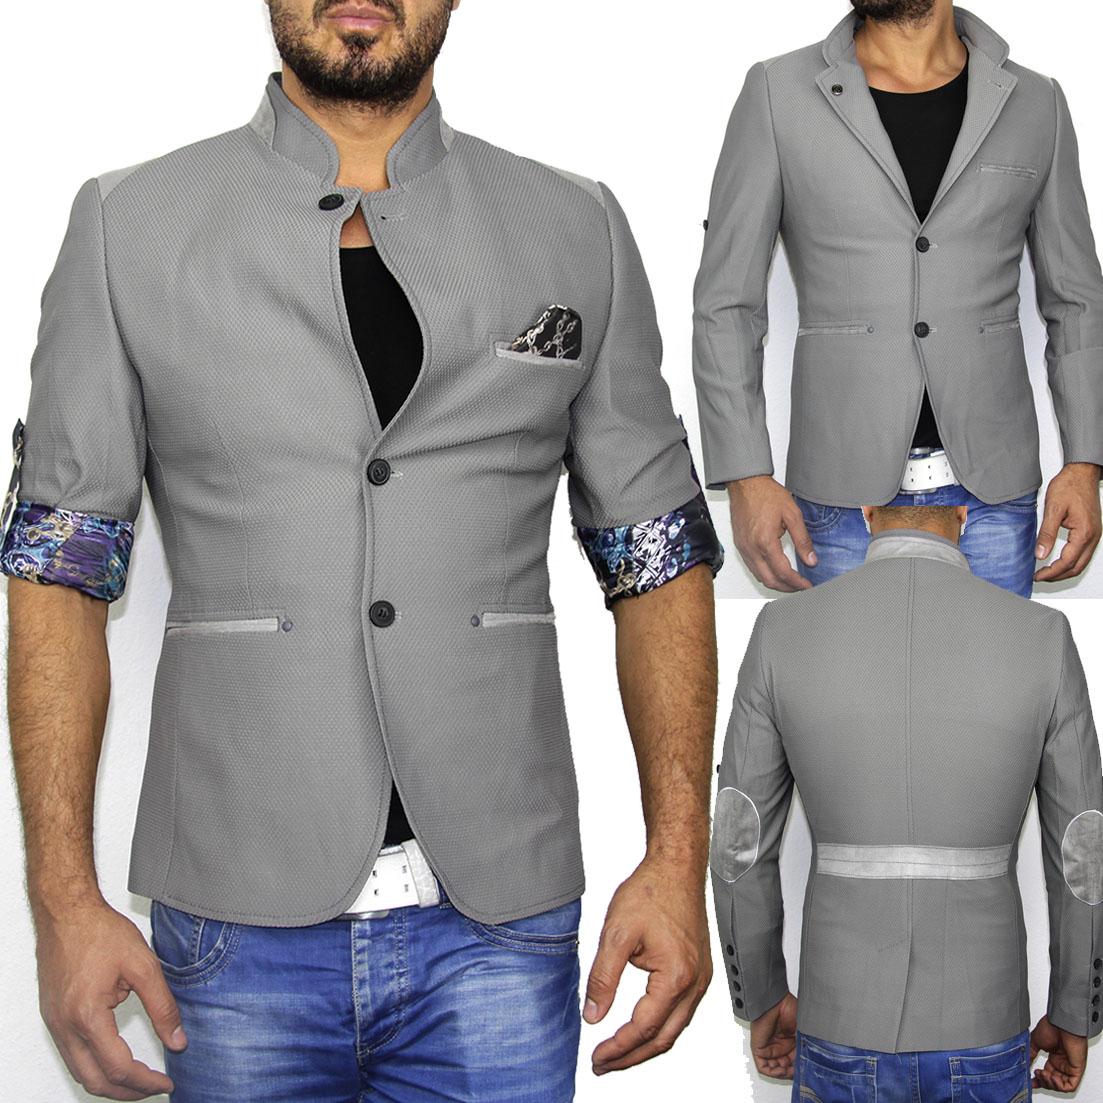 b24 nm new herren slim fit sakko blazer jacke kurzmantel. Black Bedroom Furniture Sets. Home Design Ideas